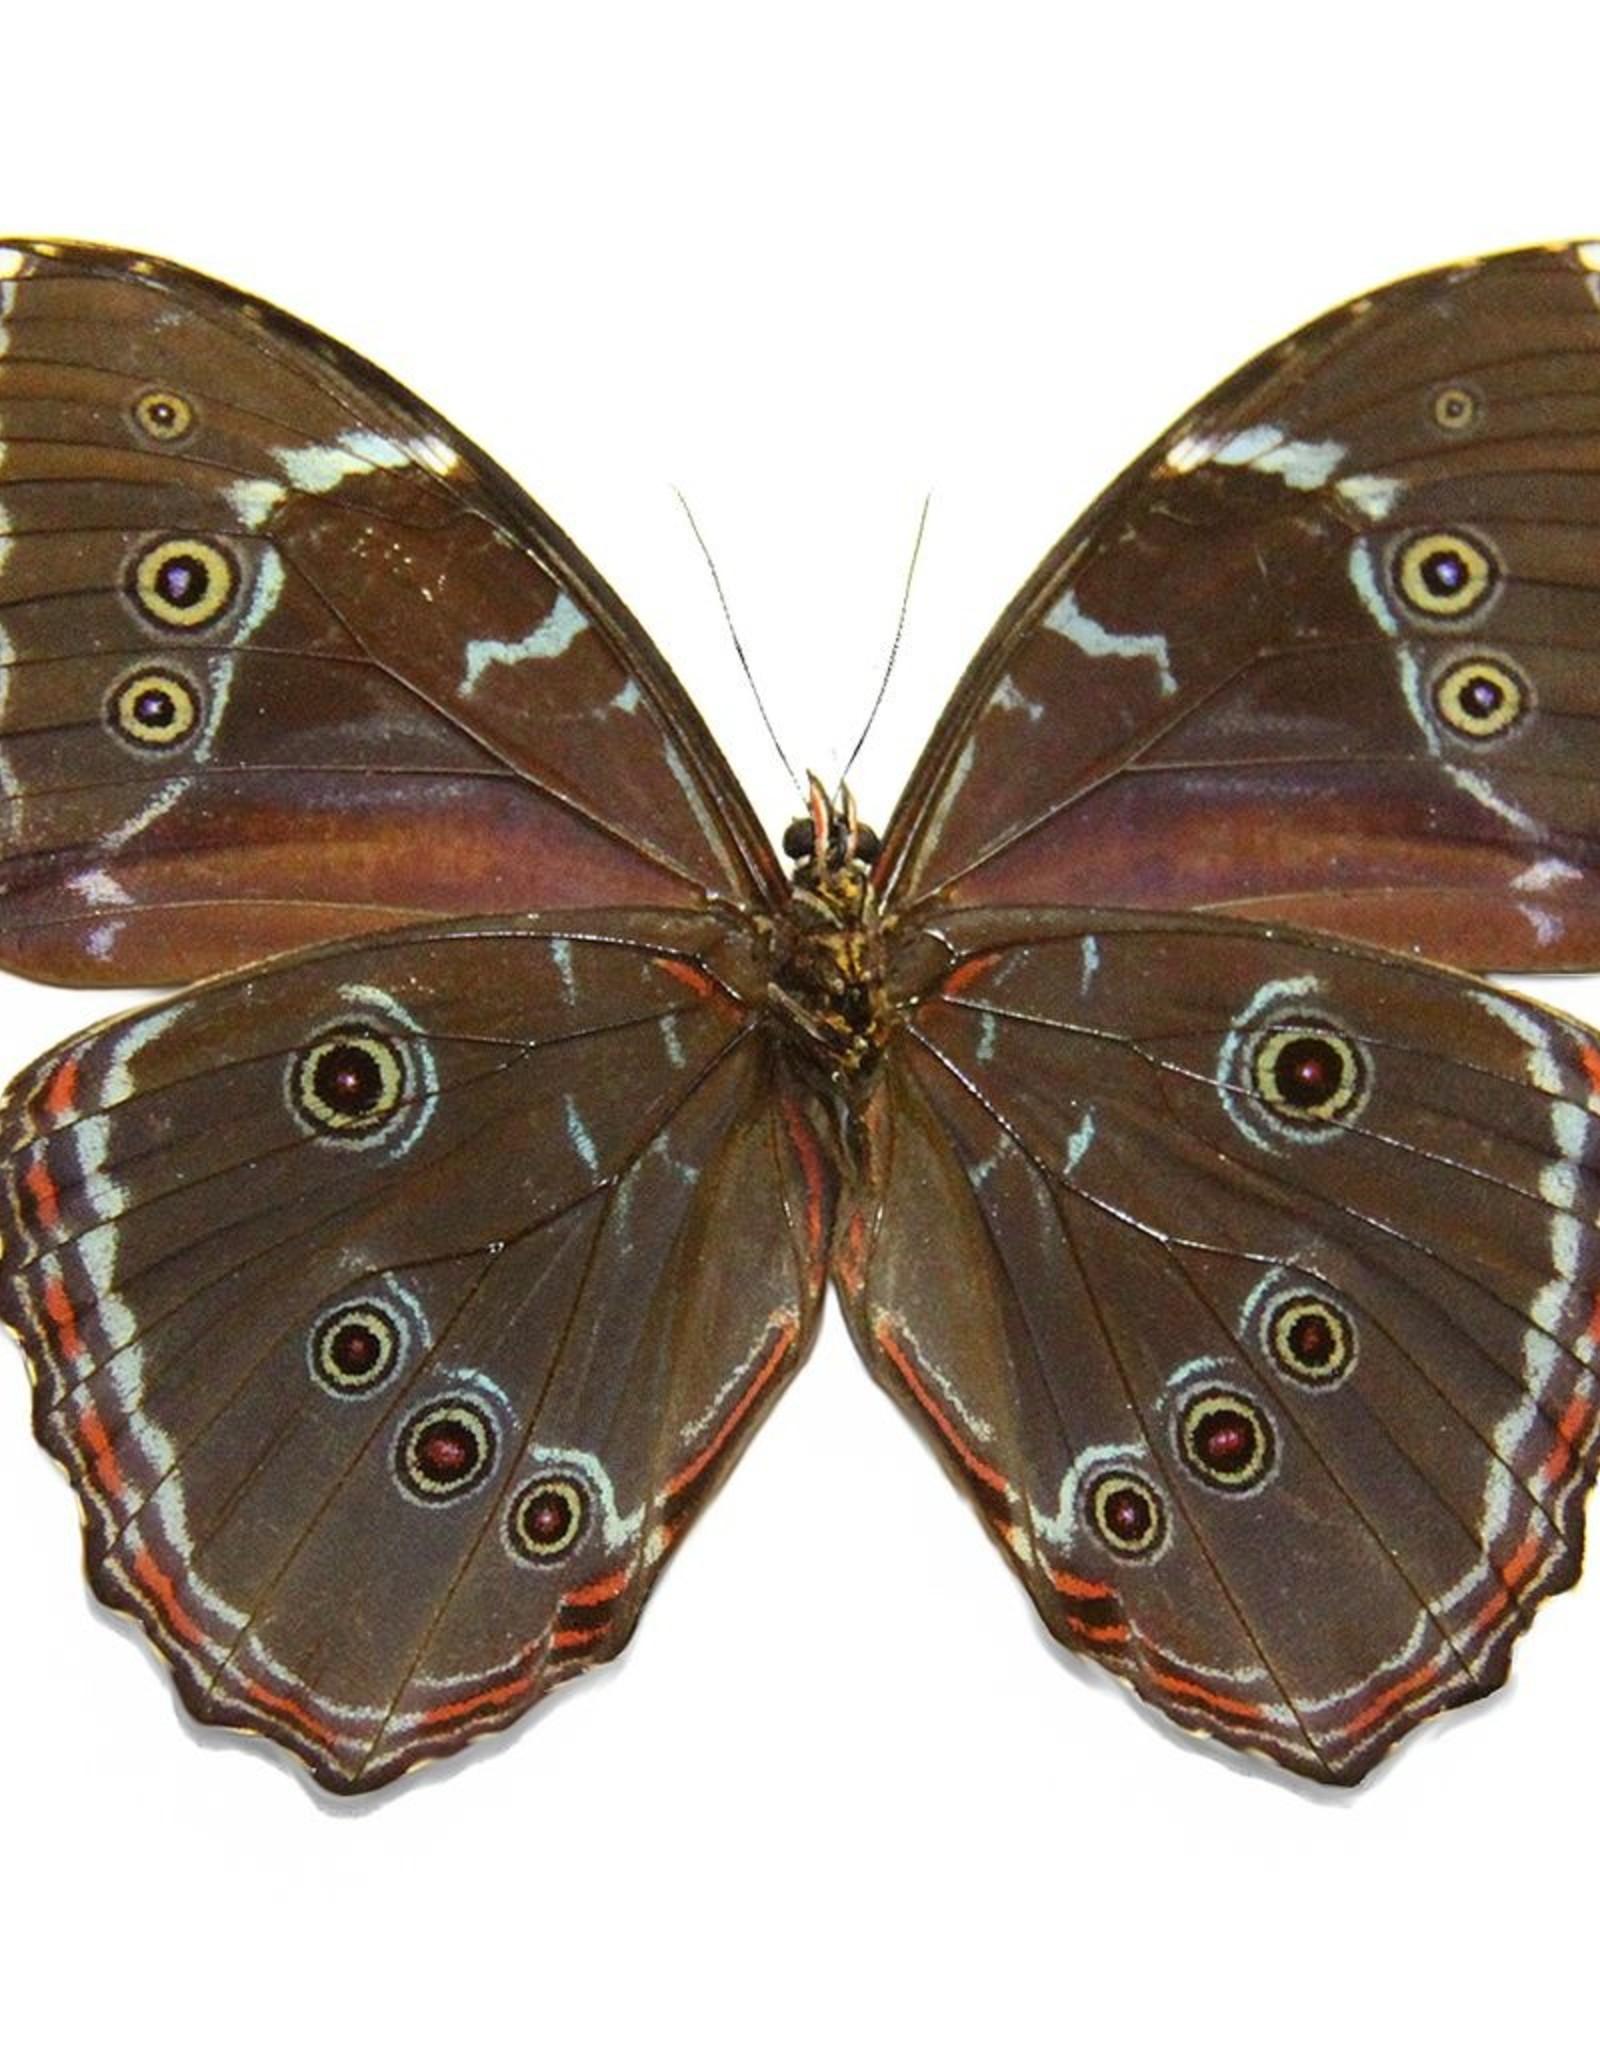 Morpho achilles fagardii (=M. patroclus orestes) M A1 Peru